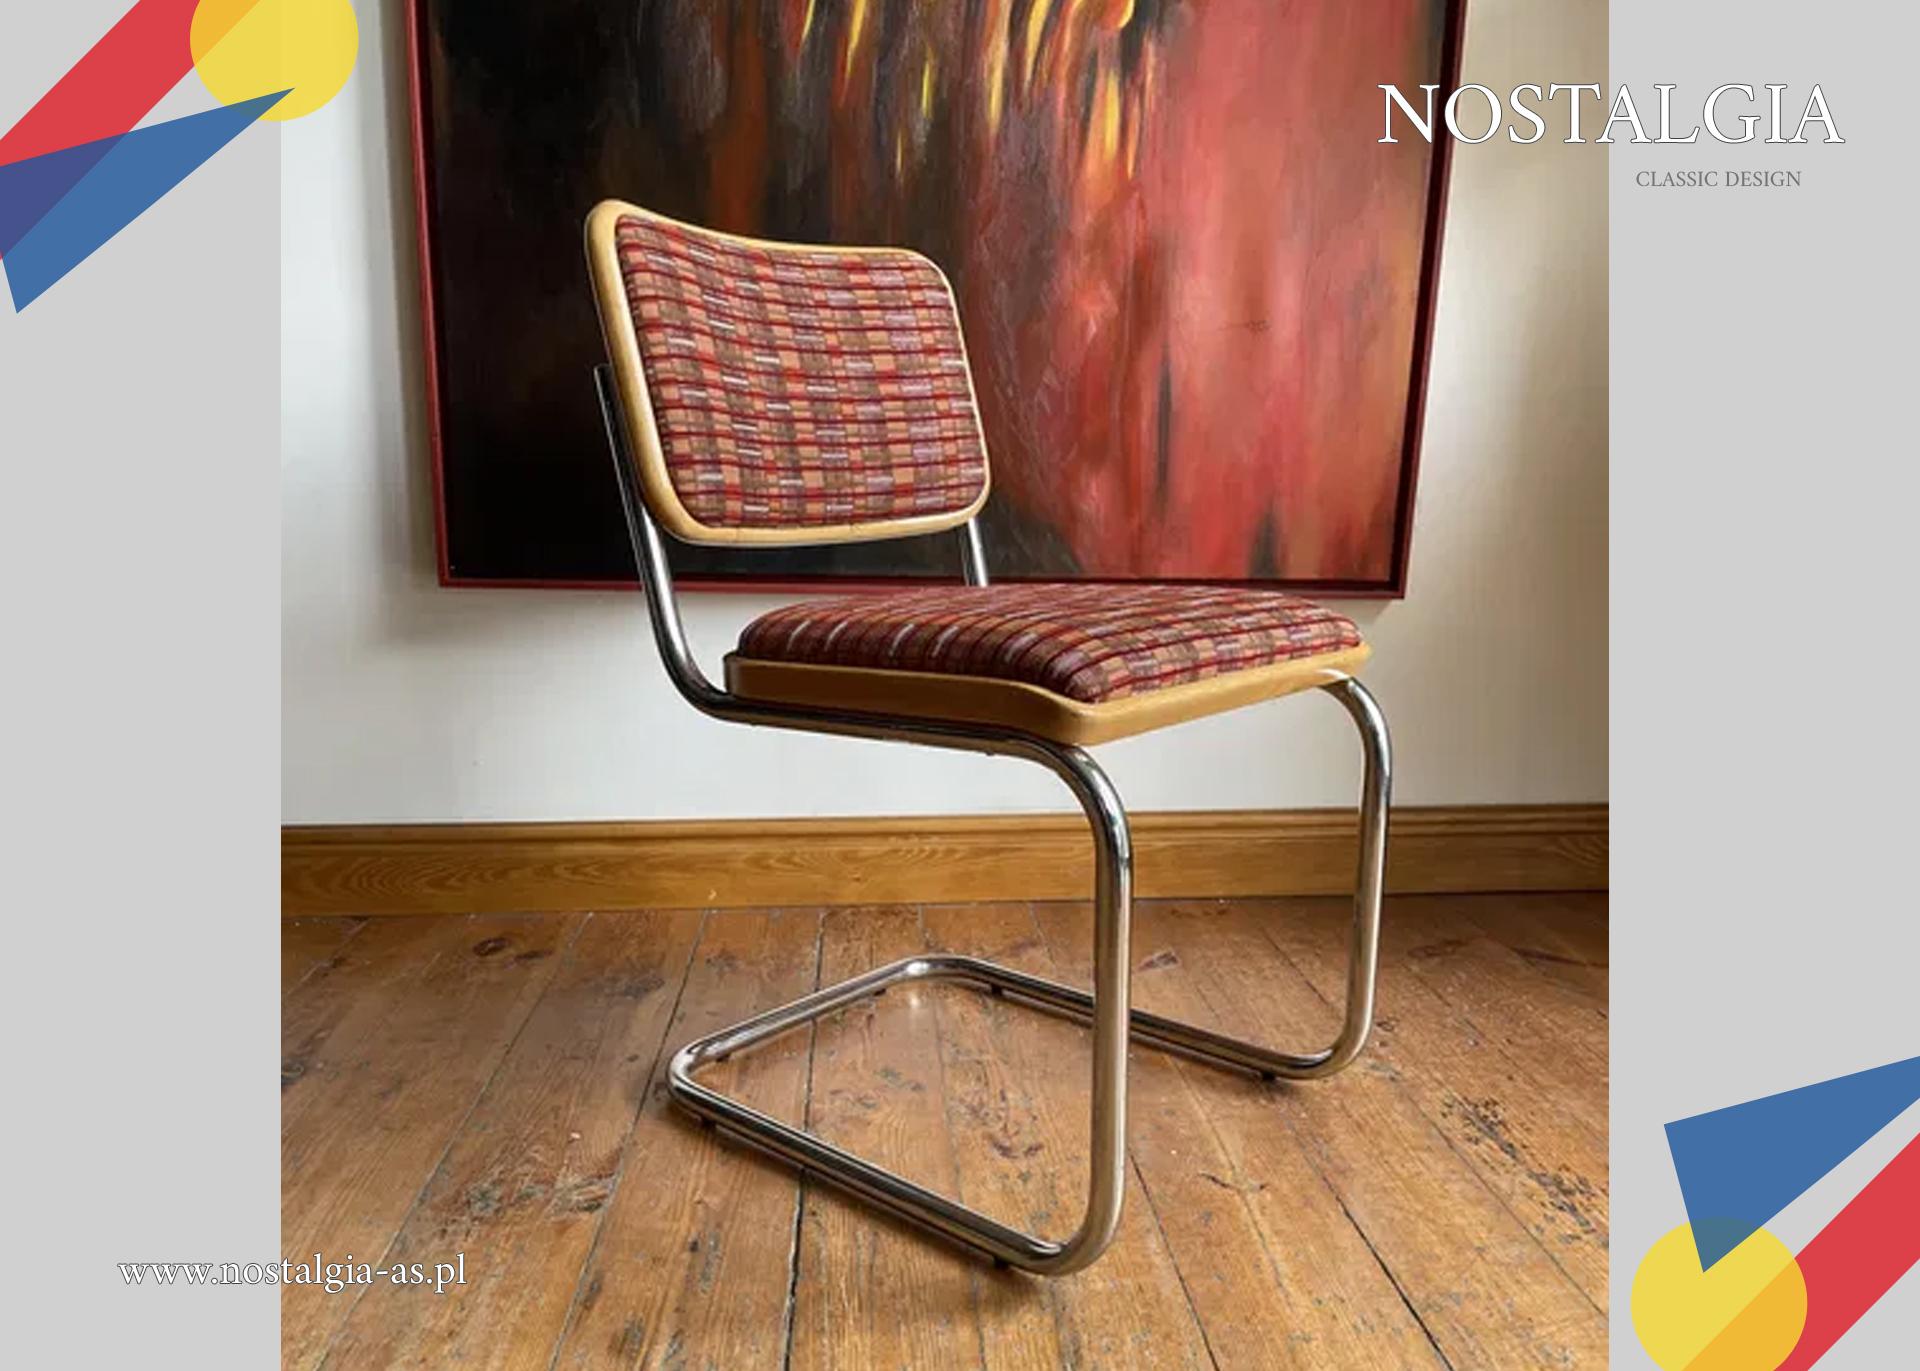 Thonet S32 Marcel Breuer Bauhaus krzesło